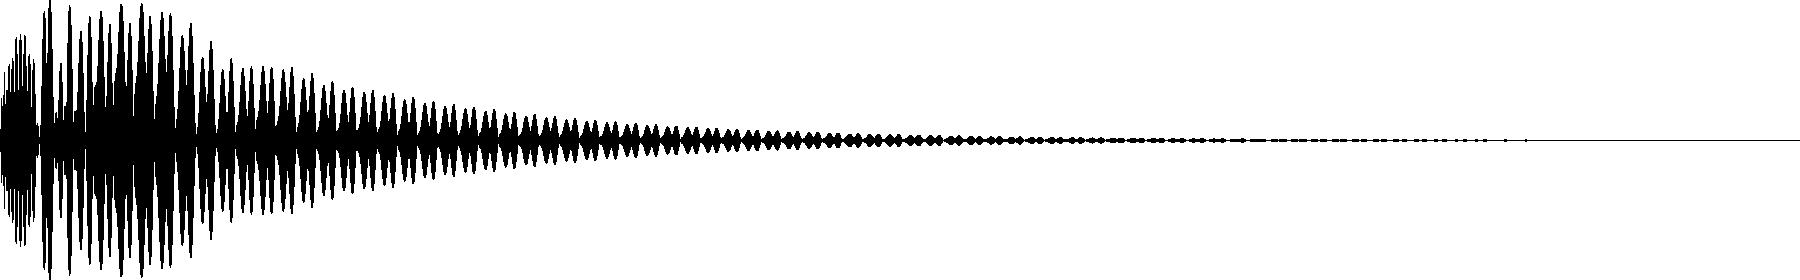 vedh bass cut 001 g